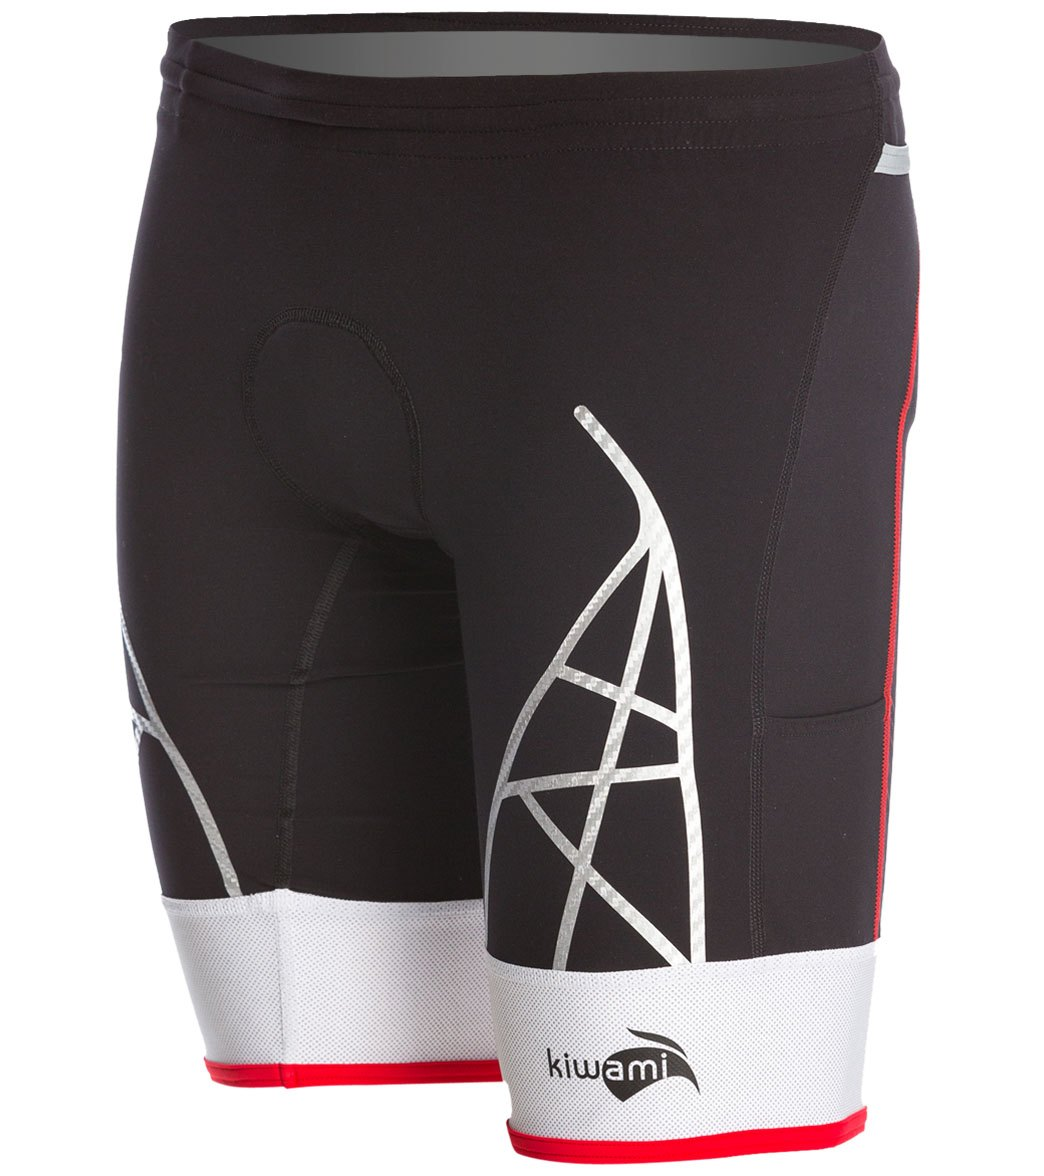 6c208f91c85 Kiwami Men s Spider Tri Shorts at SwimOutlet.com - Free Shipping